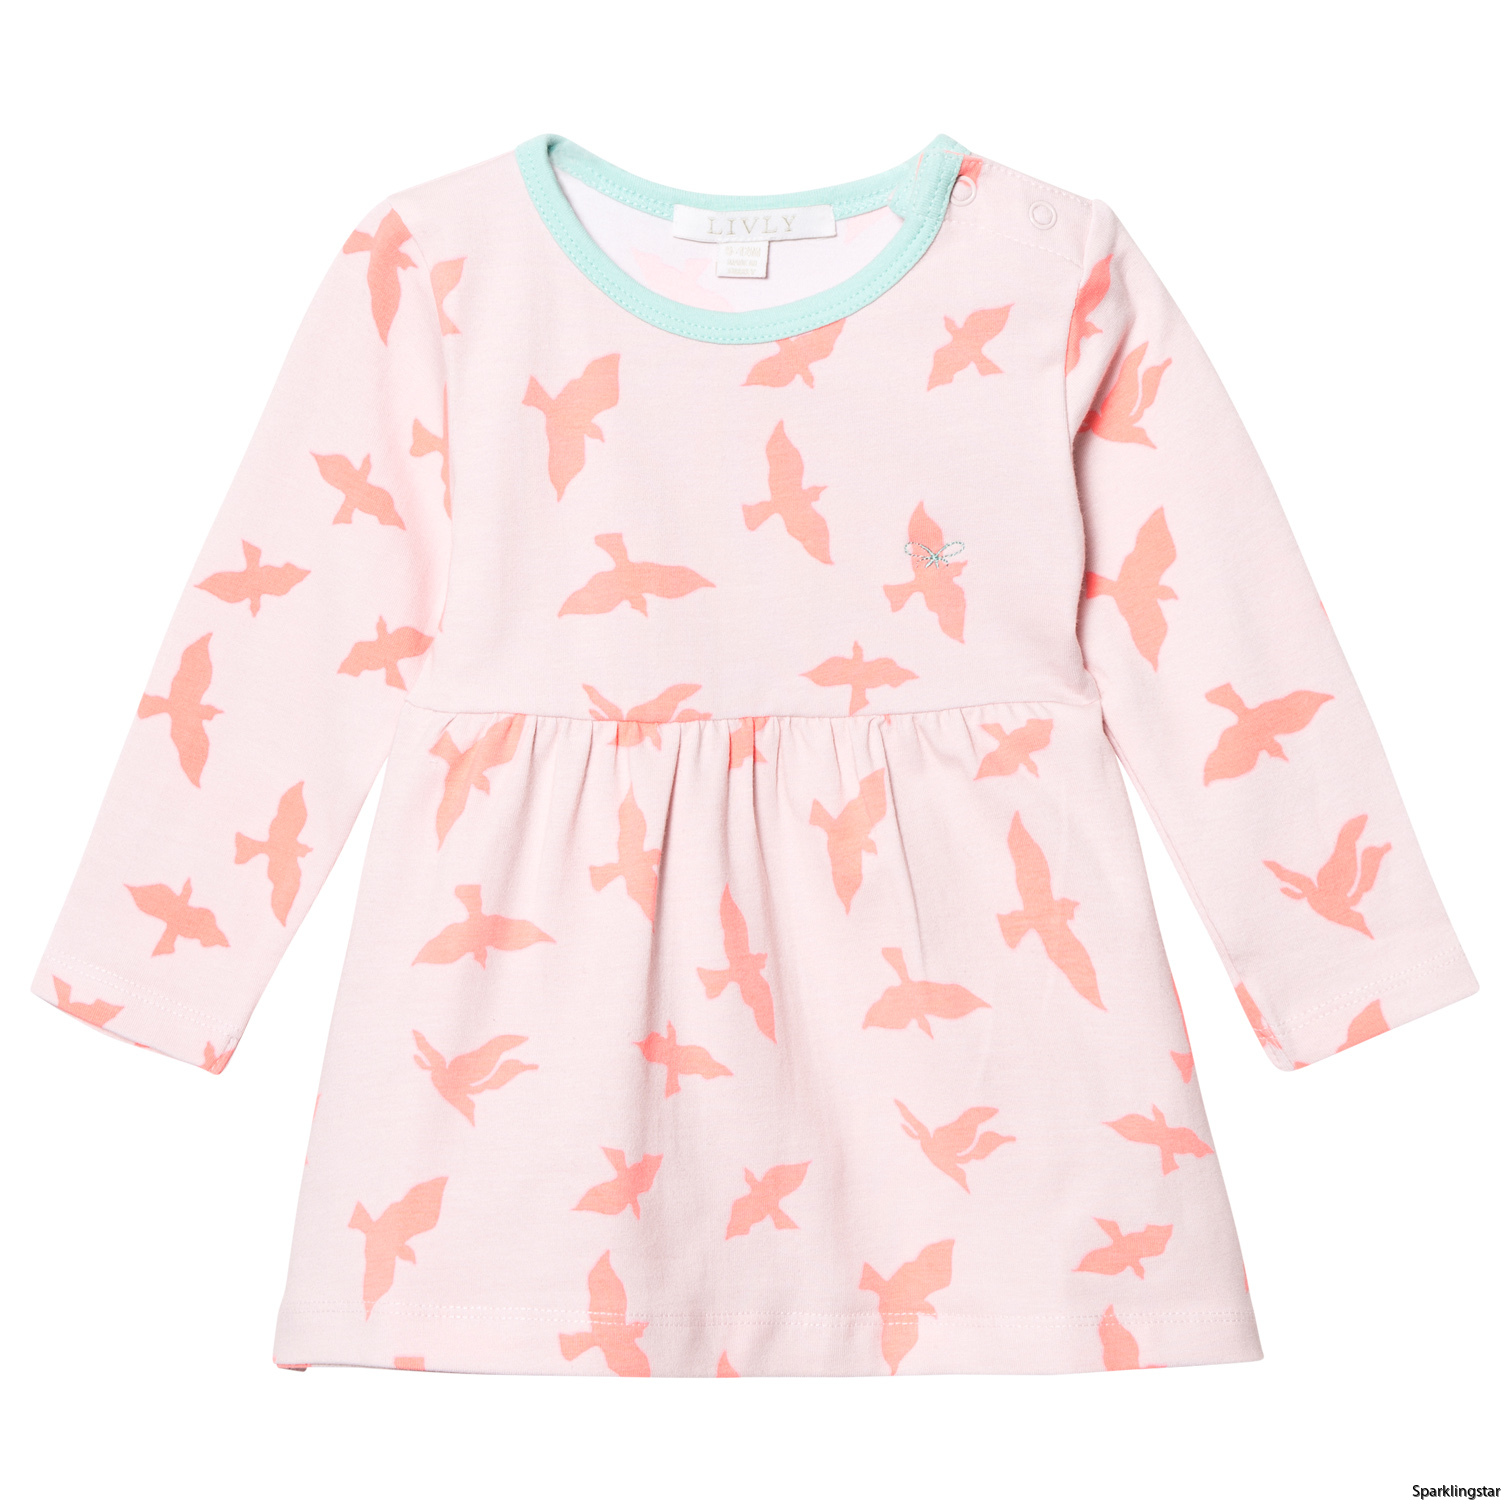 Livly Lotta Dress Pink Luna